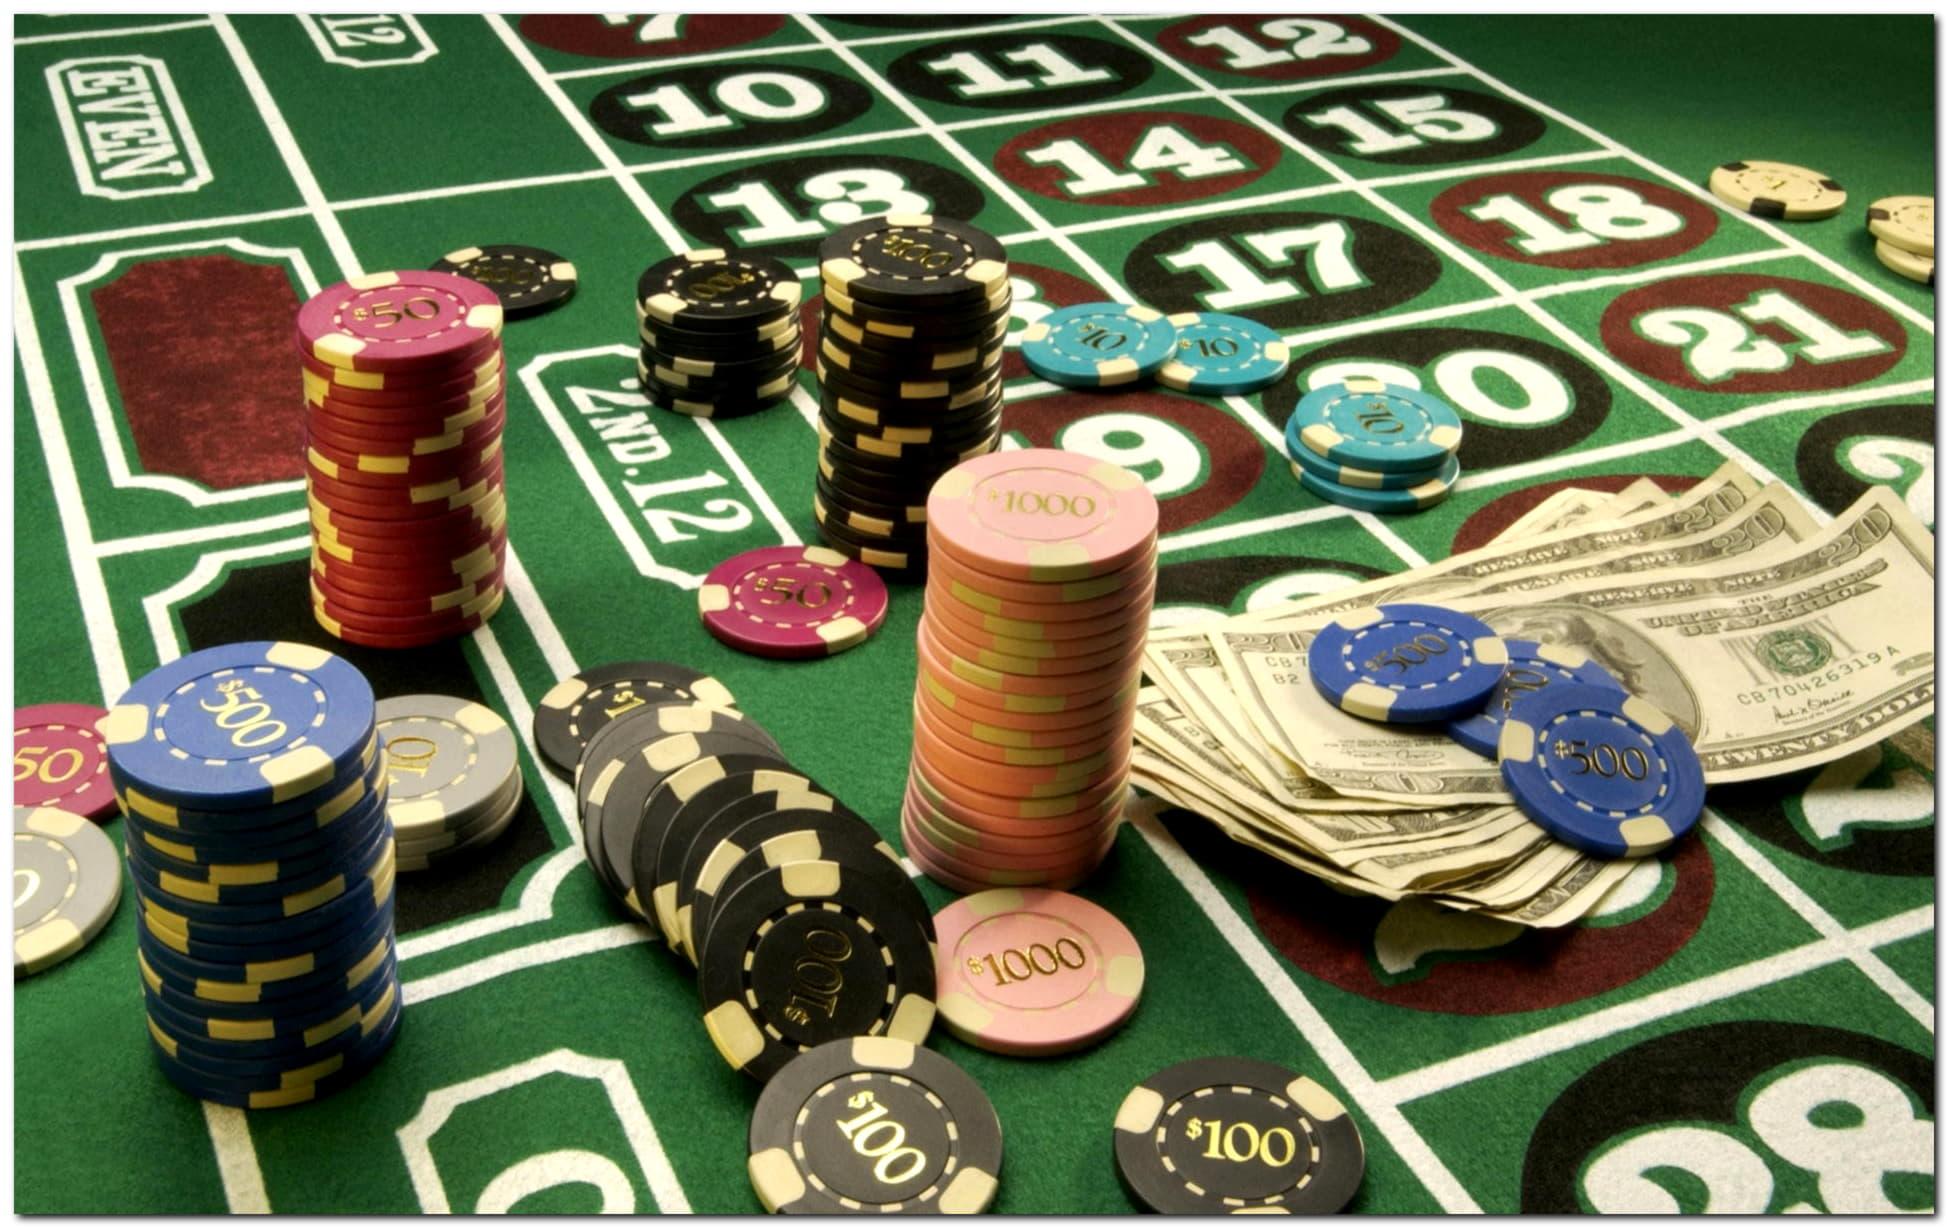 €205 Casino chip at 7 Sultans Casino